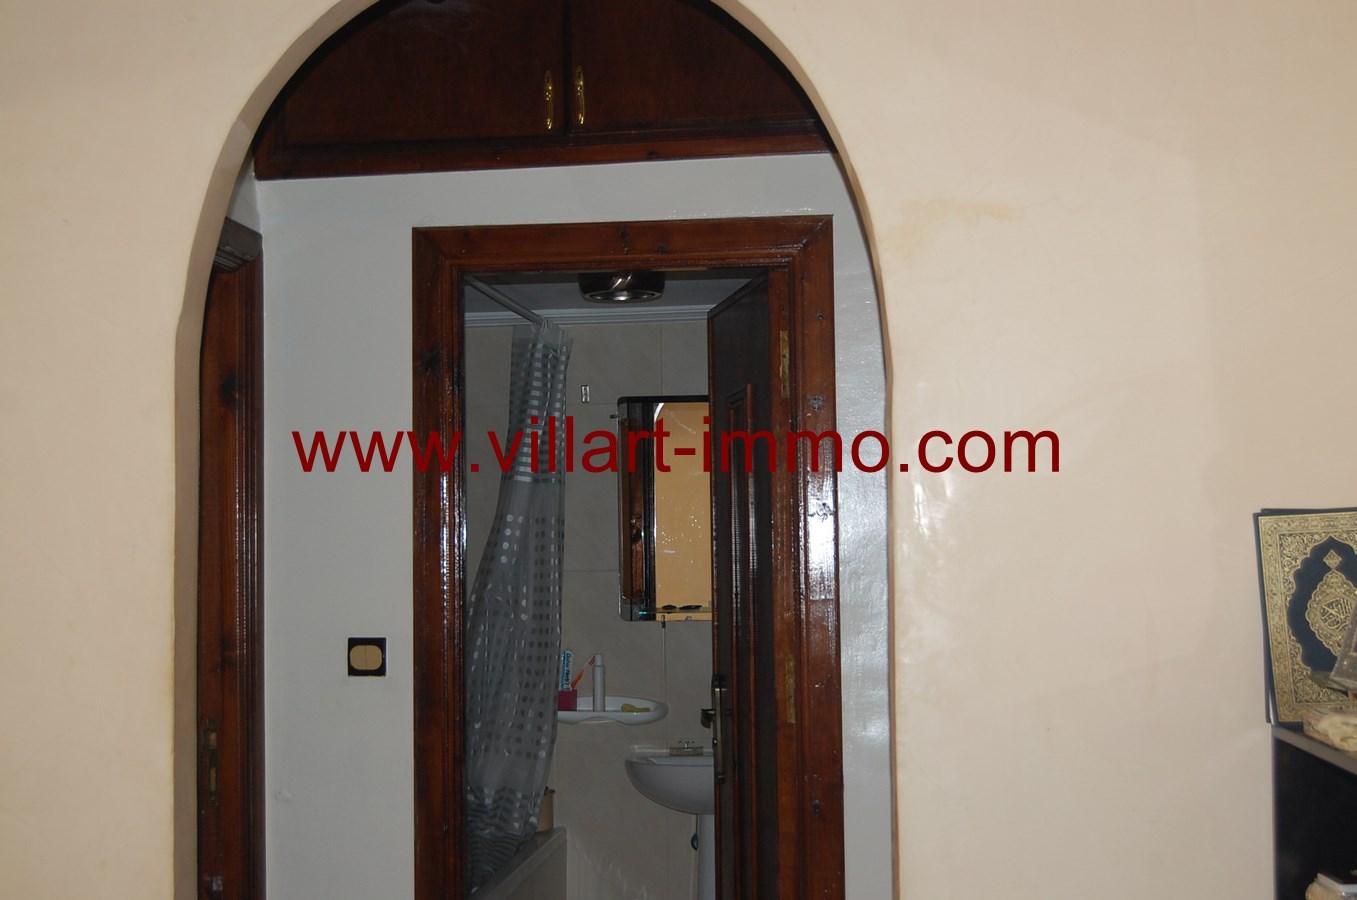 4-vente-appartement-tanger-centre-ville-salle-de-bain-va458-villart-immo